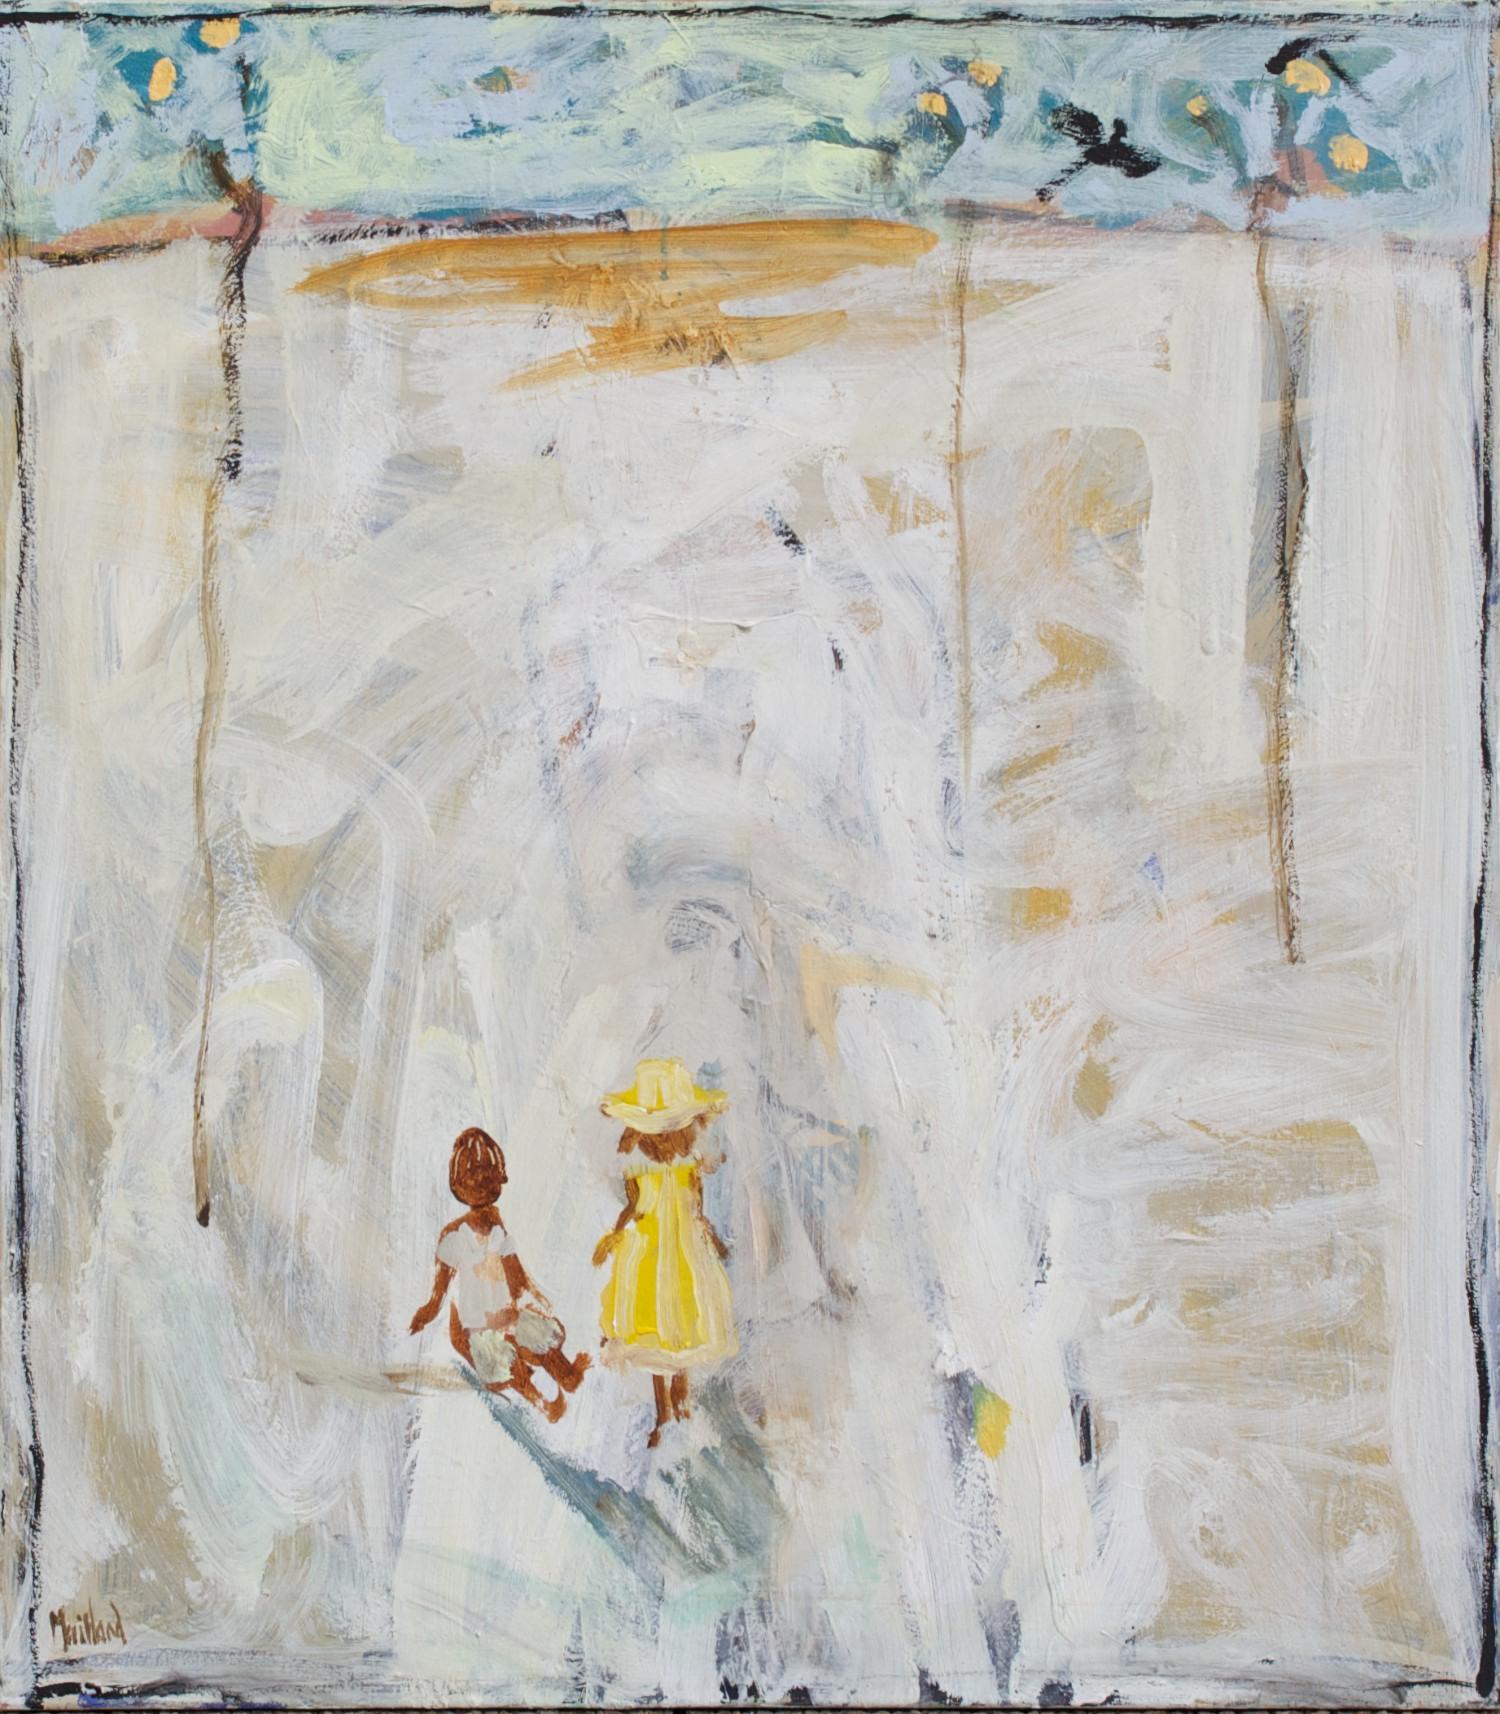 #14740 John Maitland 'Little Yellow Trees' Mixed media on canvas 85cm x 75cm